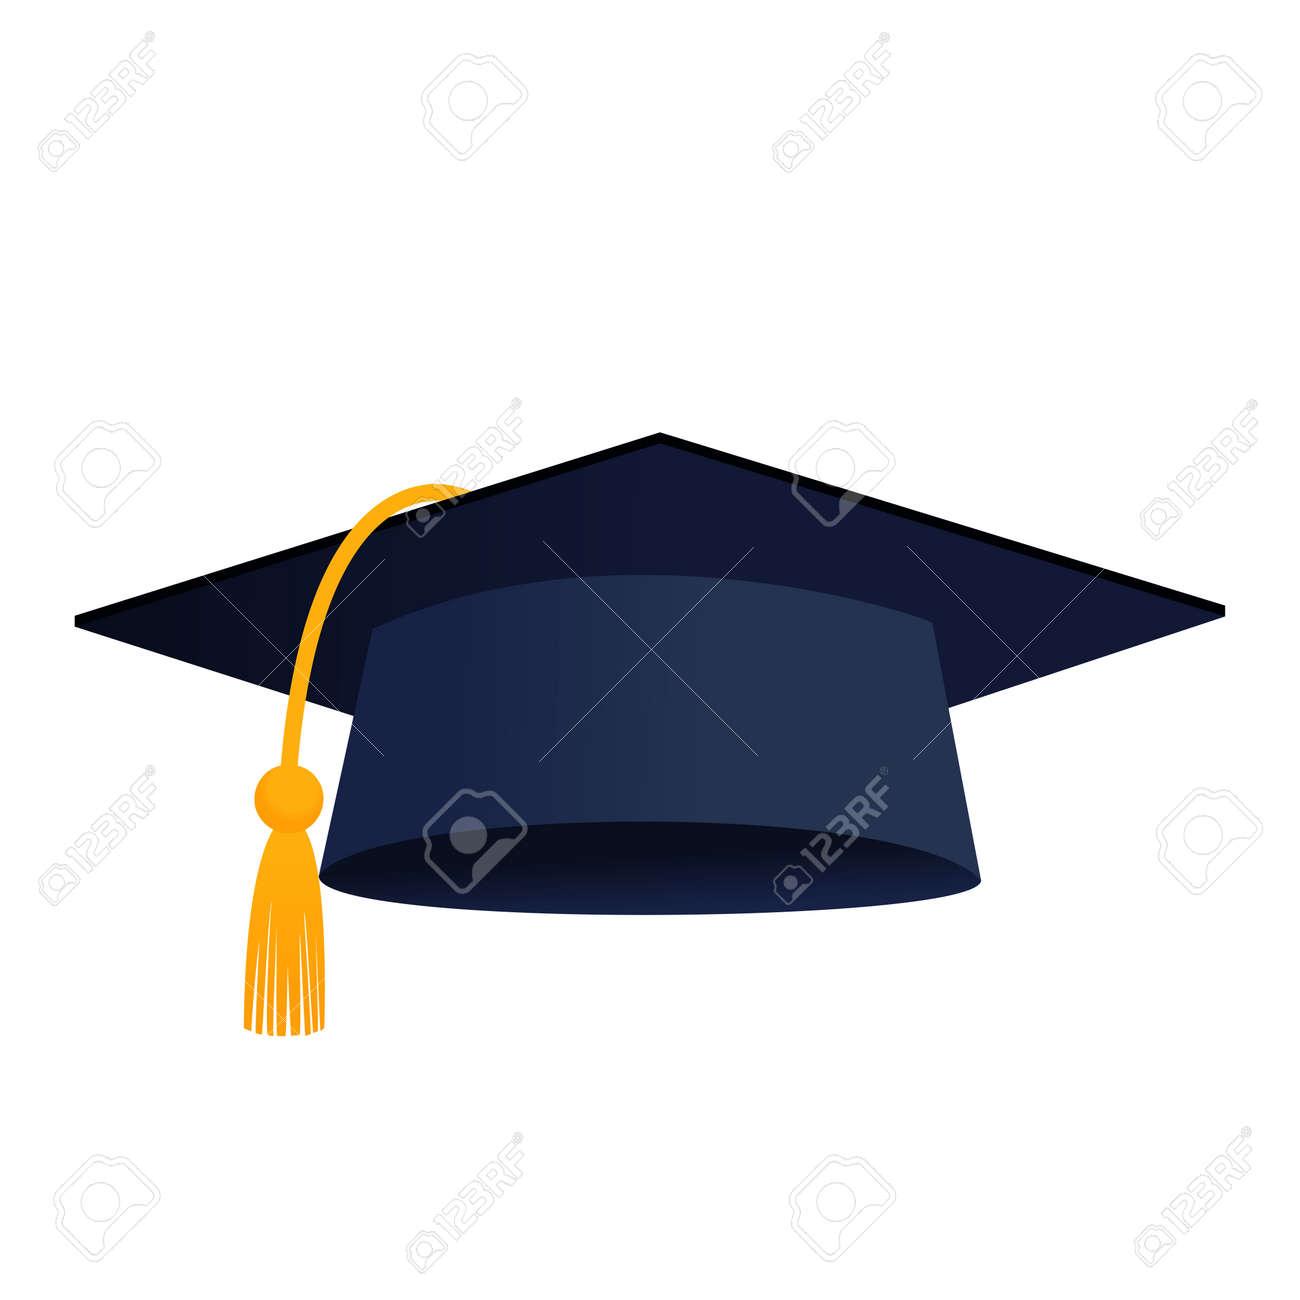 Graduation cap hat isolated vector icon - 156093215